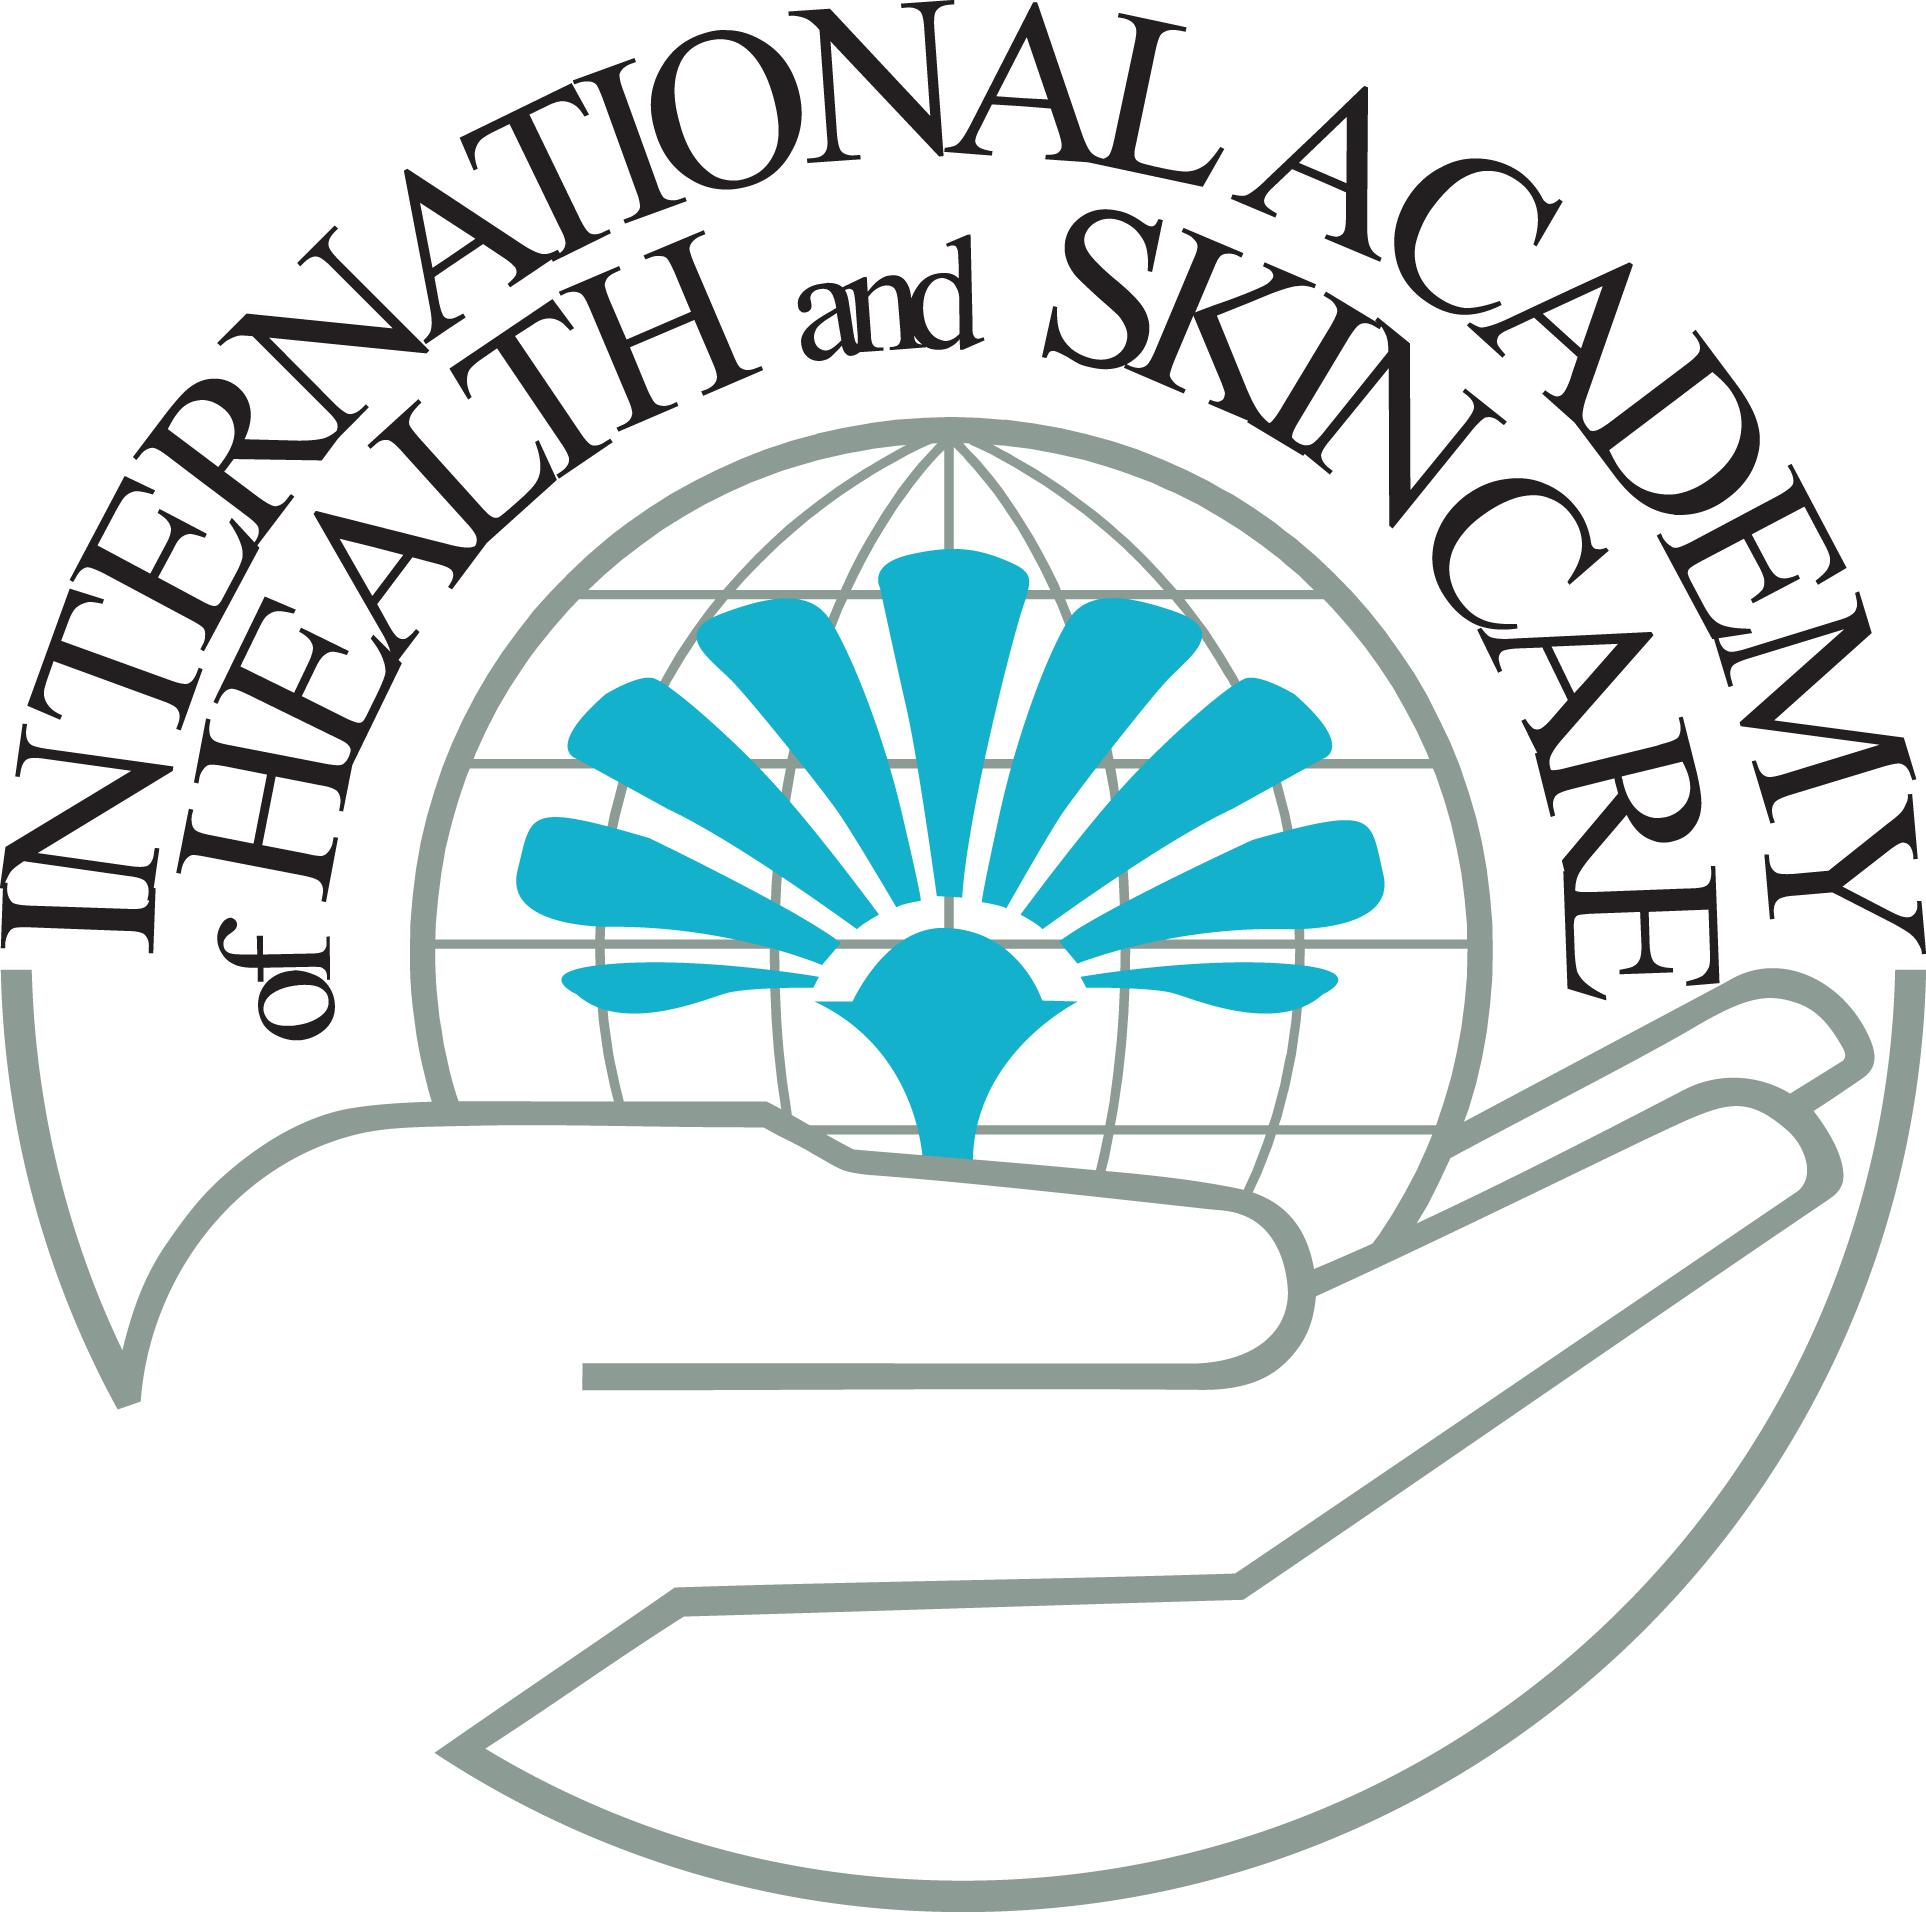 International Academy of Health and Skincare